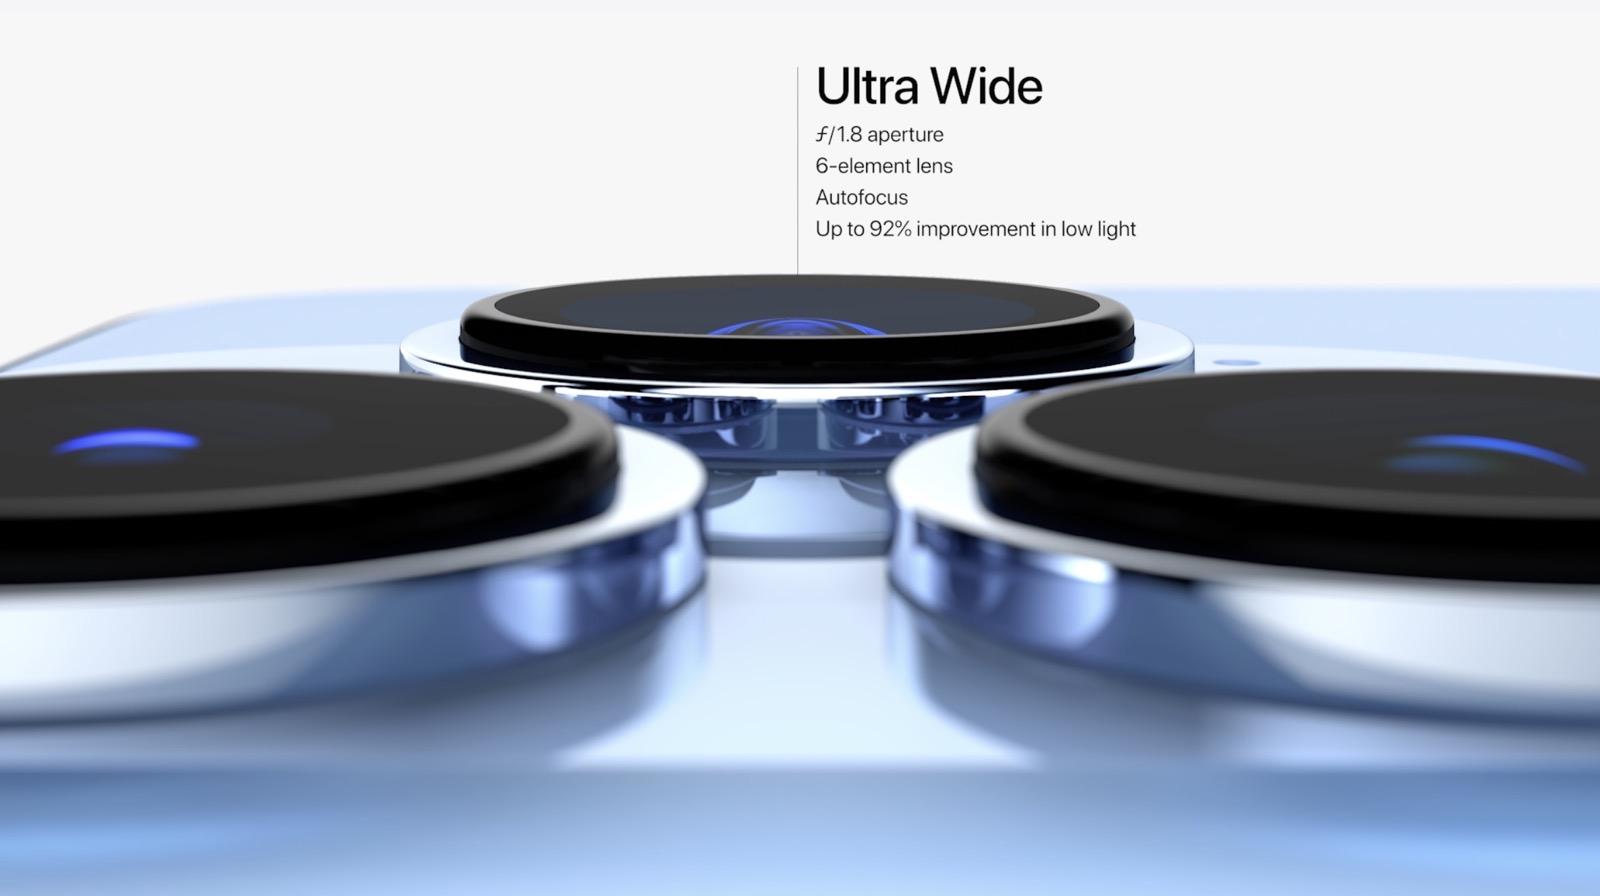 iPhone 13 Proの超広角レンズ仕様